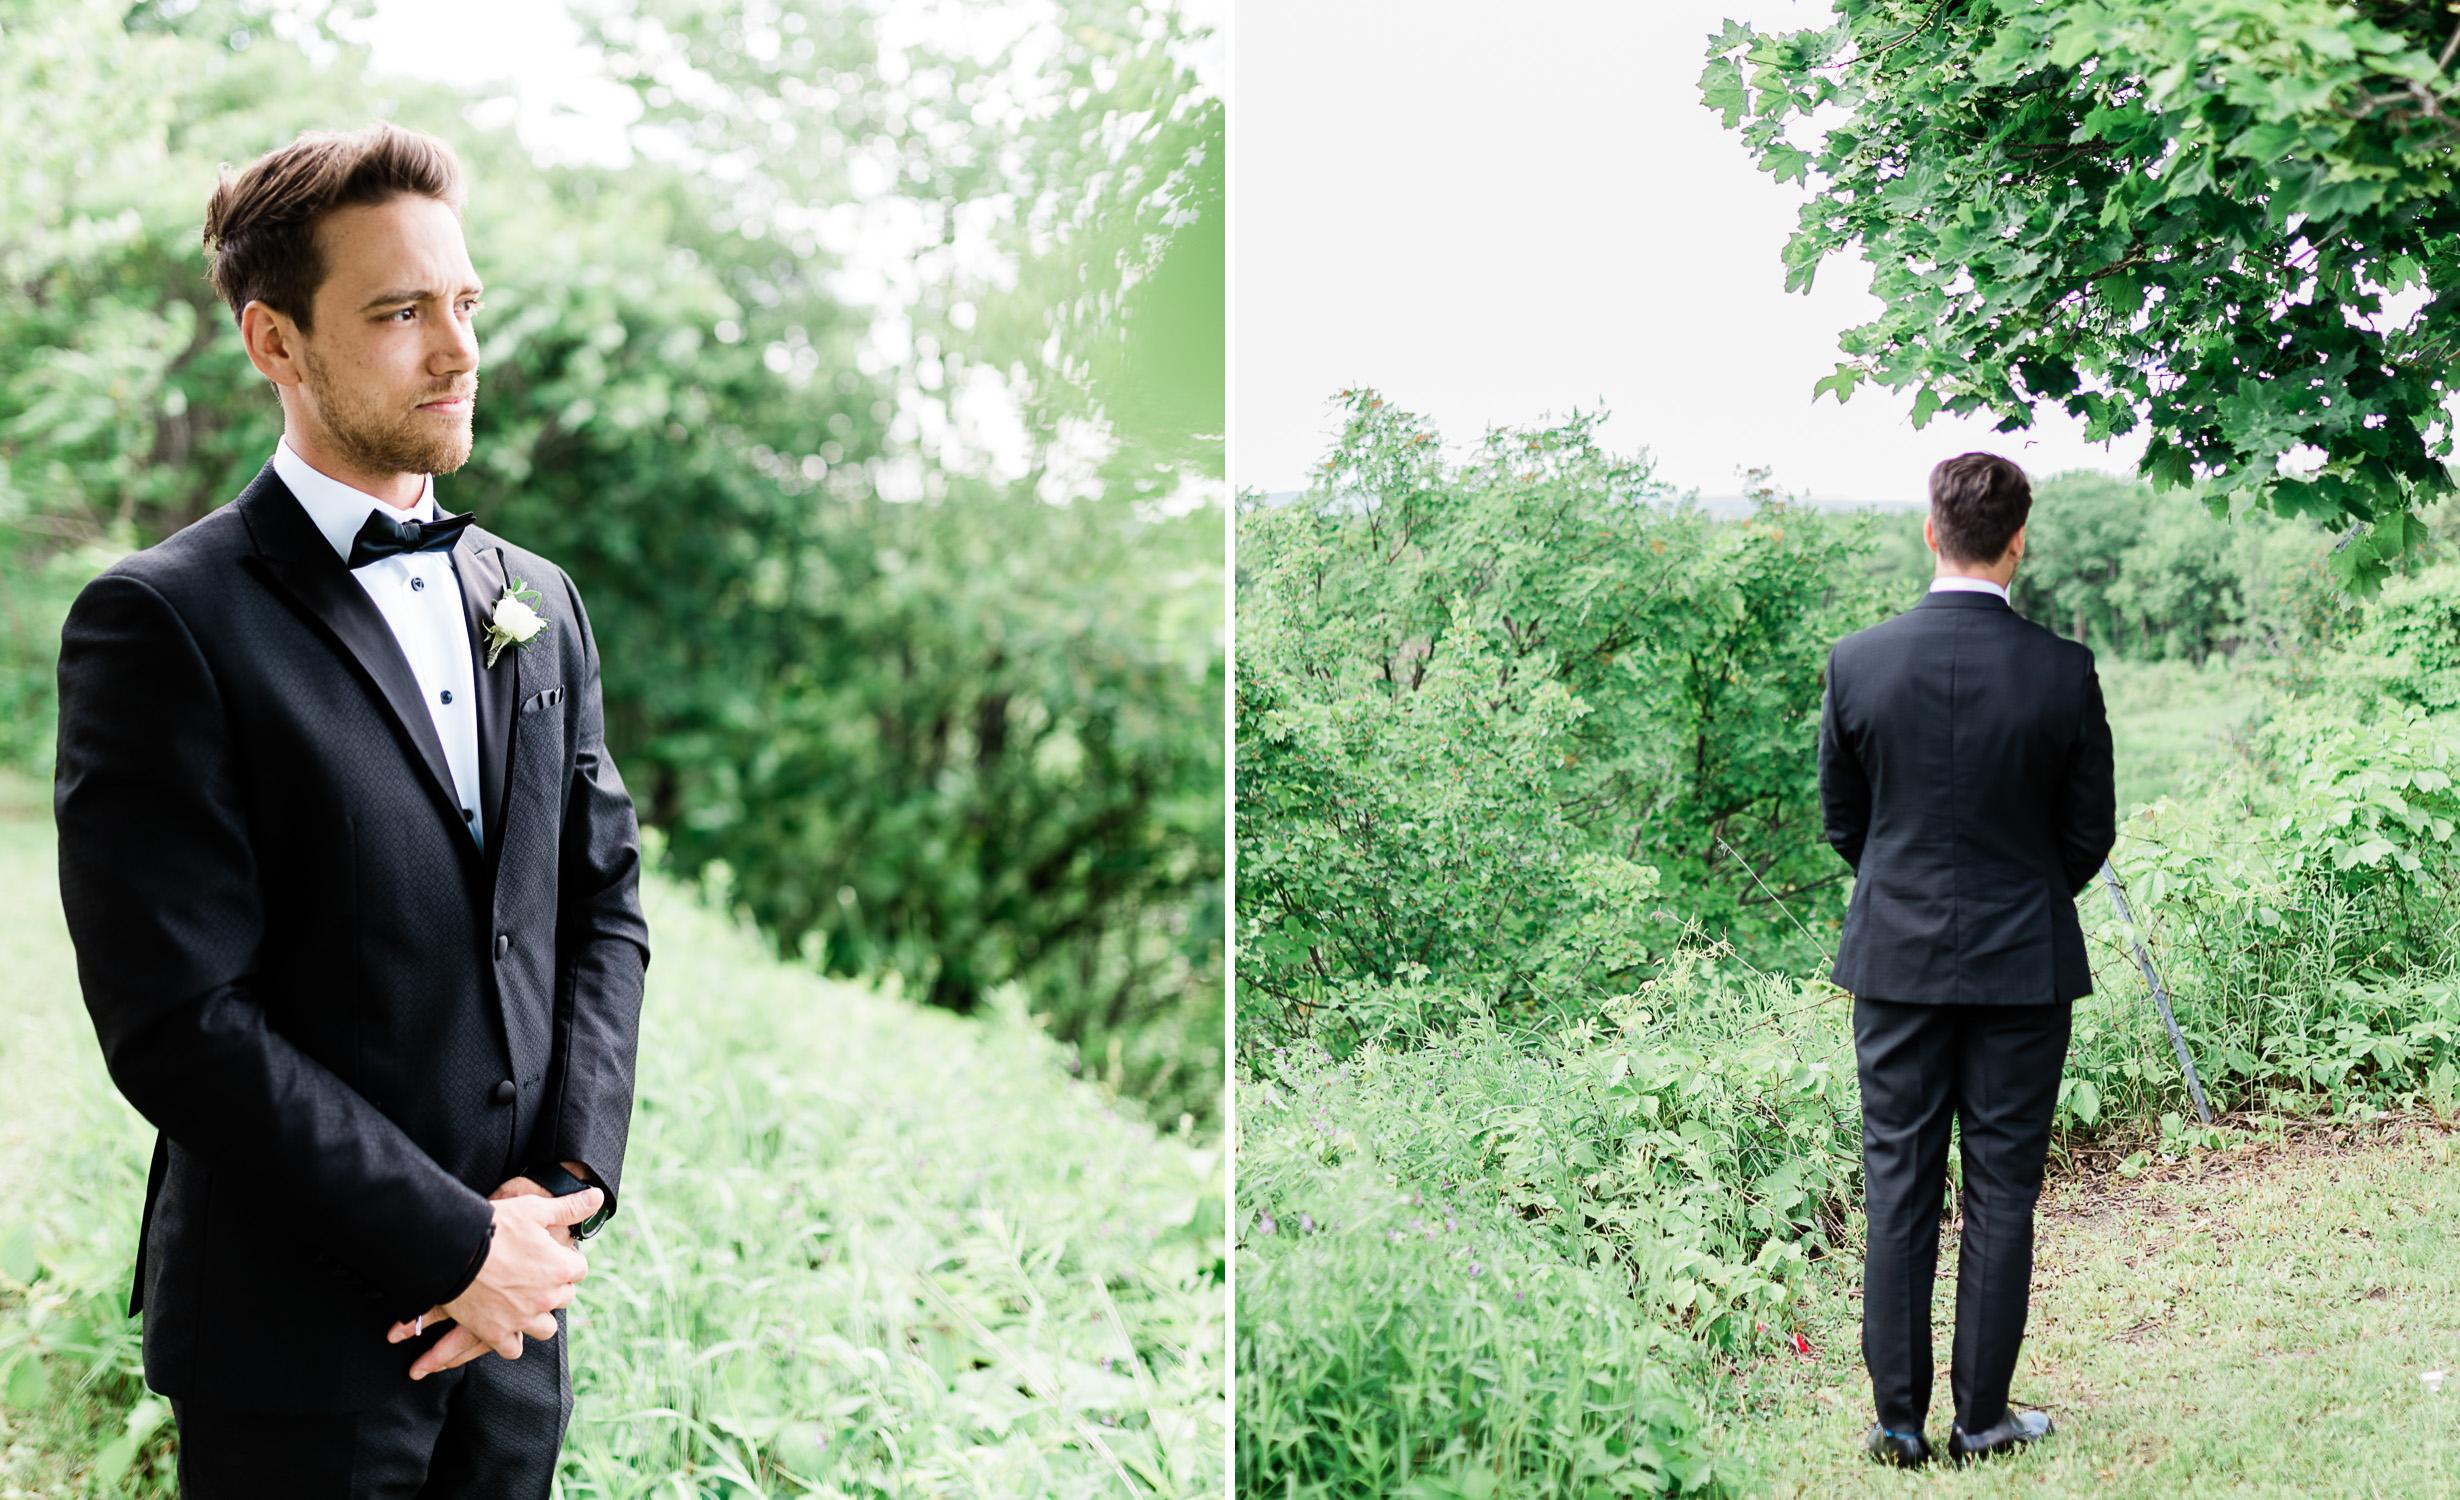 photo mariage salle du quai cap blanc quebec first look toscane elisa photographe 2141 - MALYE + ANTHONY | Québec, Salle du Quai du Cap Blanc | Photographe de mariage | Elisa Photography